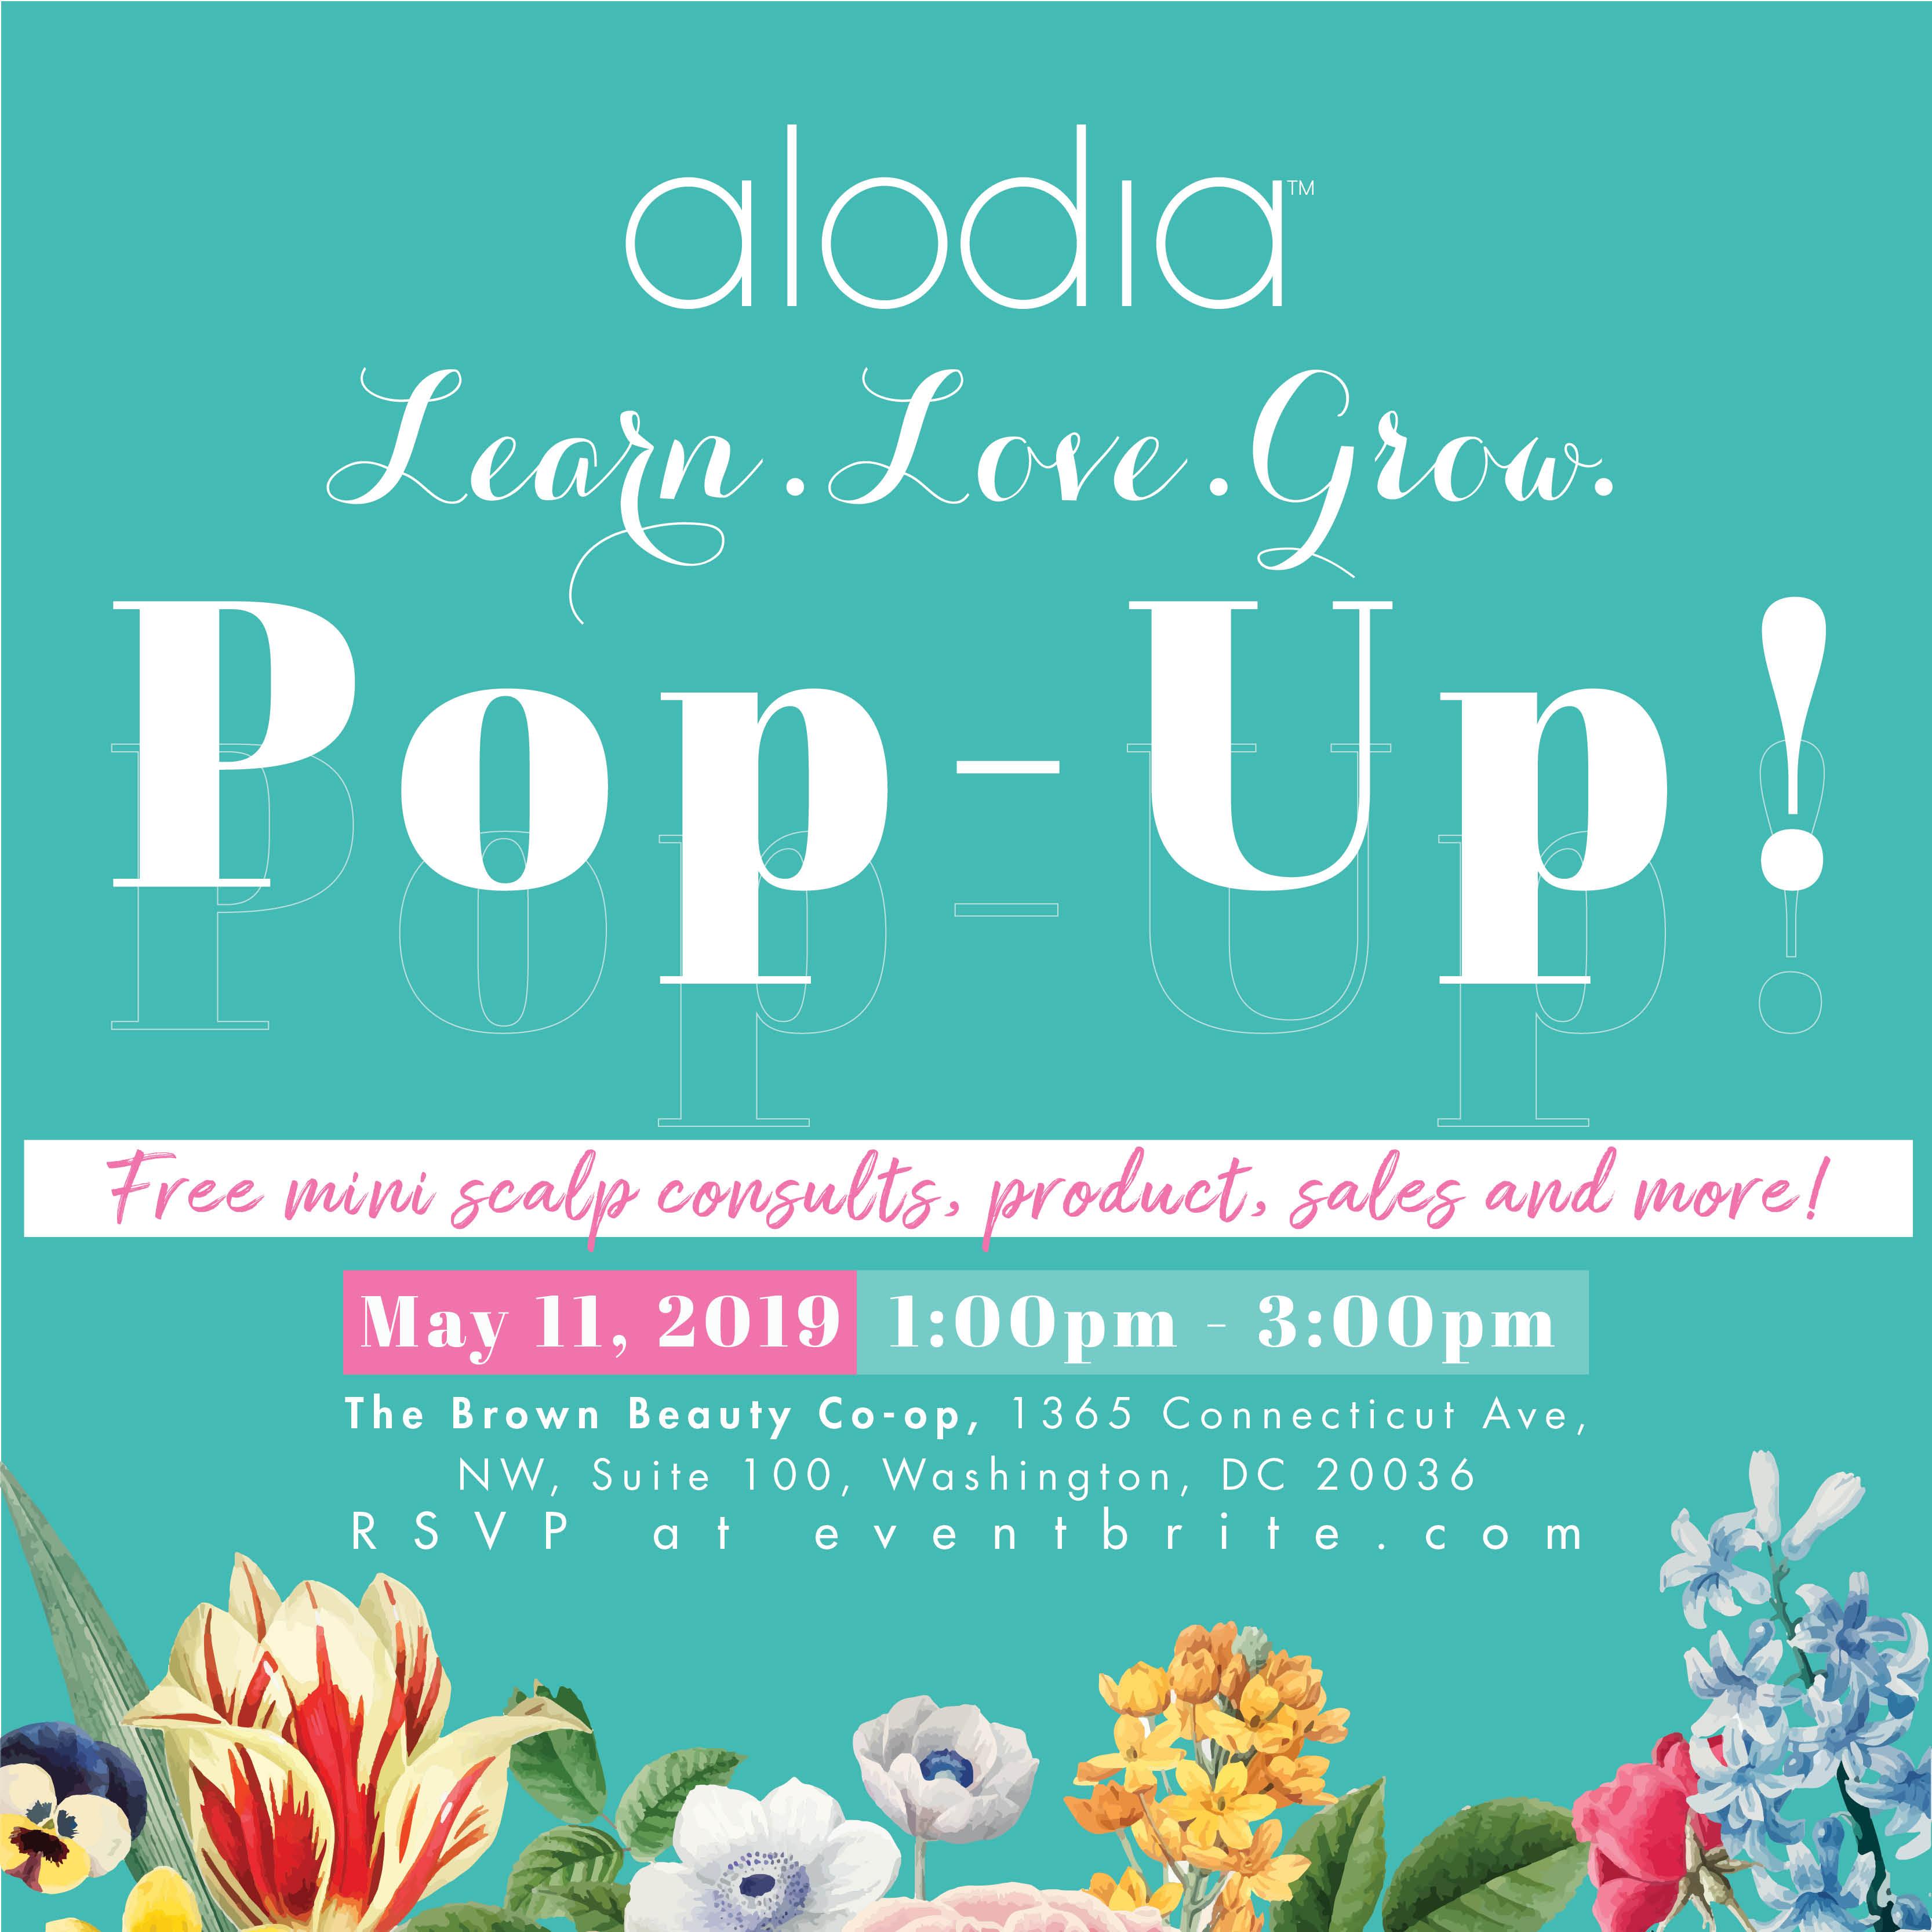 Learn Love Grow! Alodia Hair Care's Spring Pop-Up Event - 11